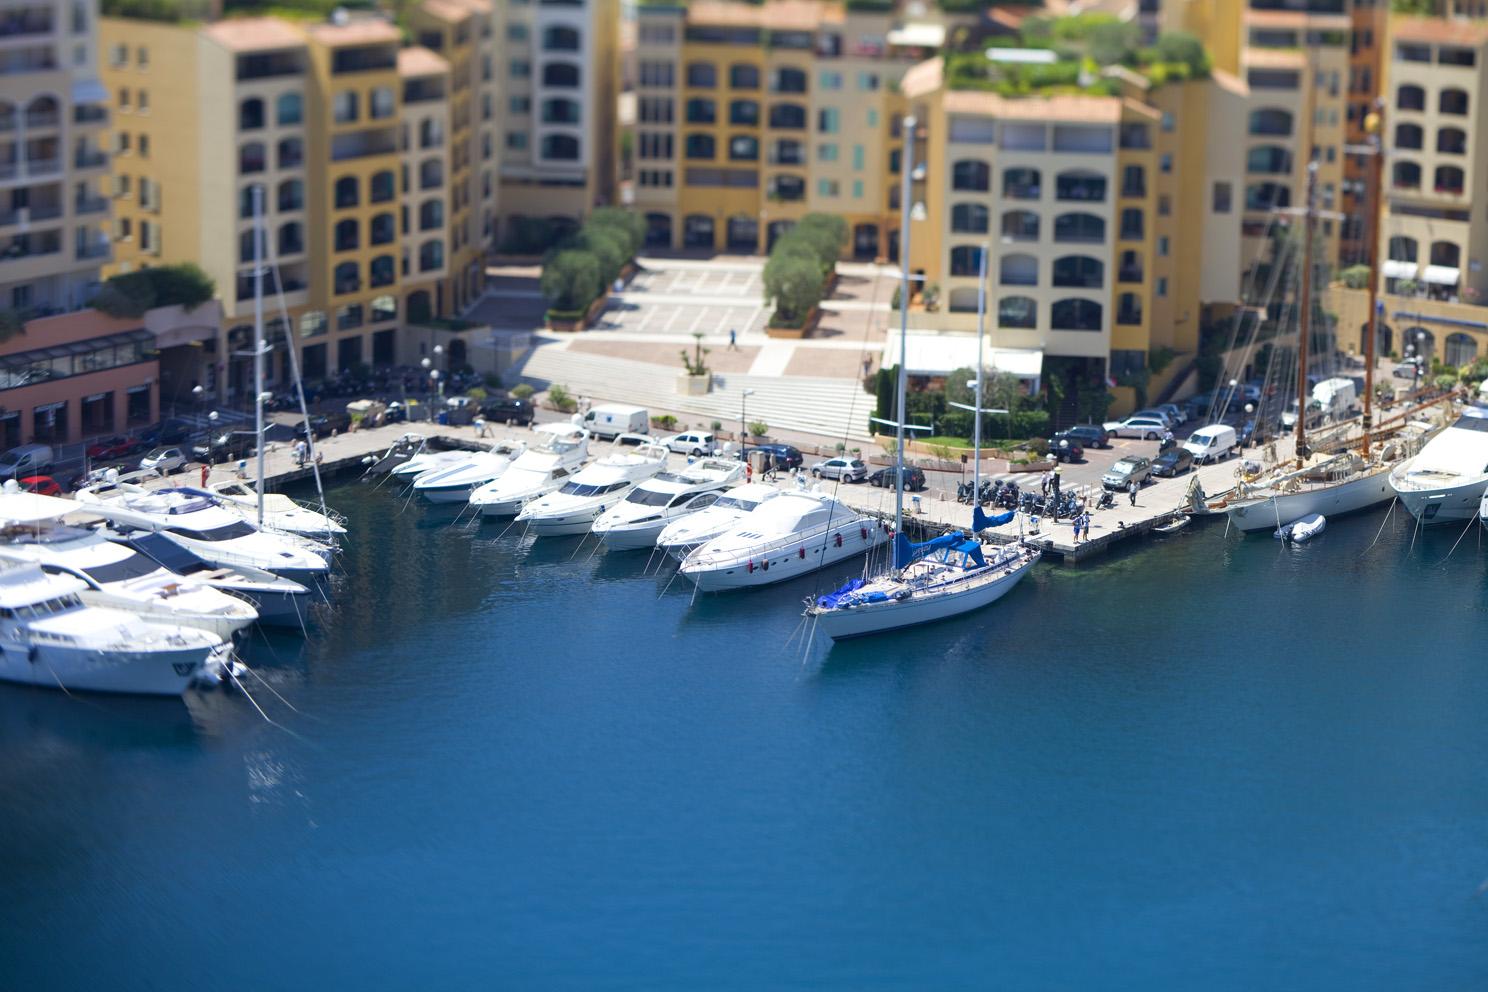 Tilt shift photographs taken around Monaco while filming video during the Grand Prix